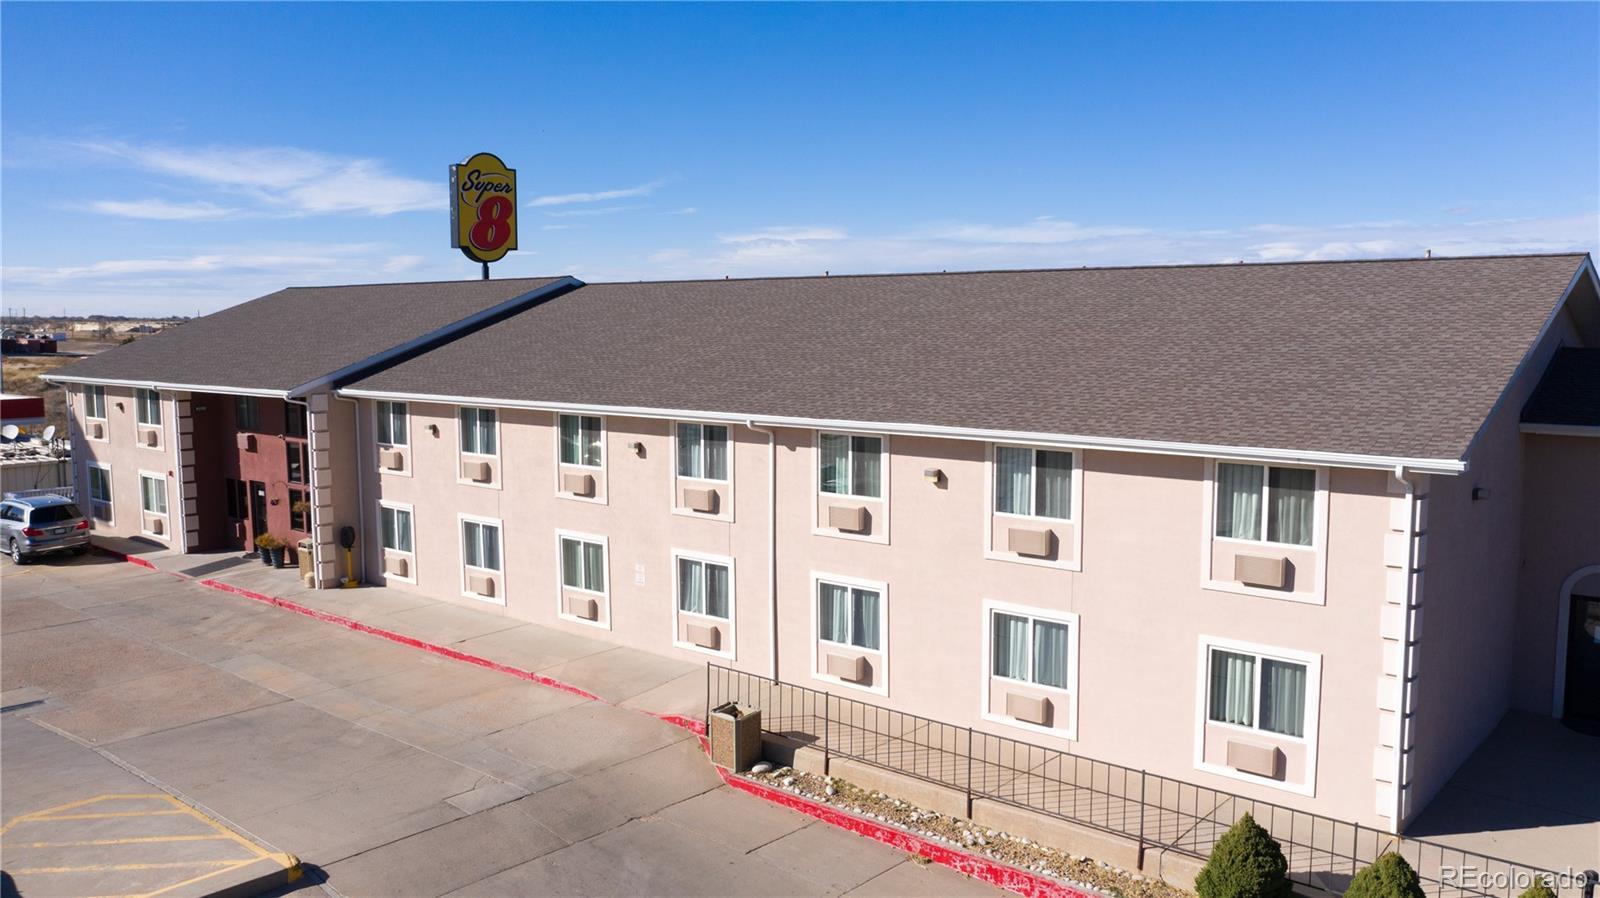 1220 Main Street, Fort Morgan, CO 80701 - Fort Morgan, CO real estate listing